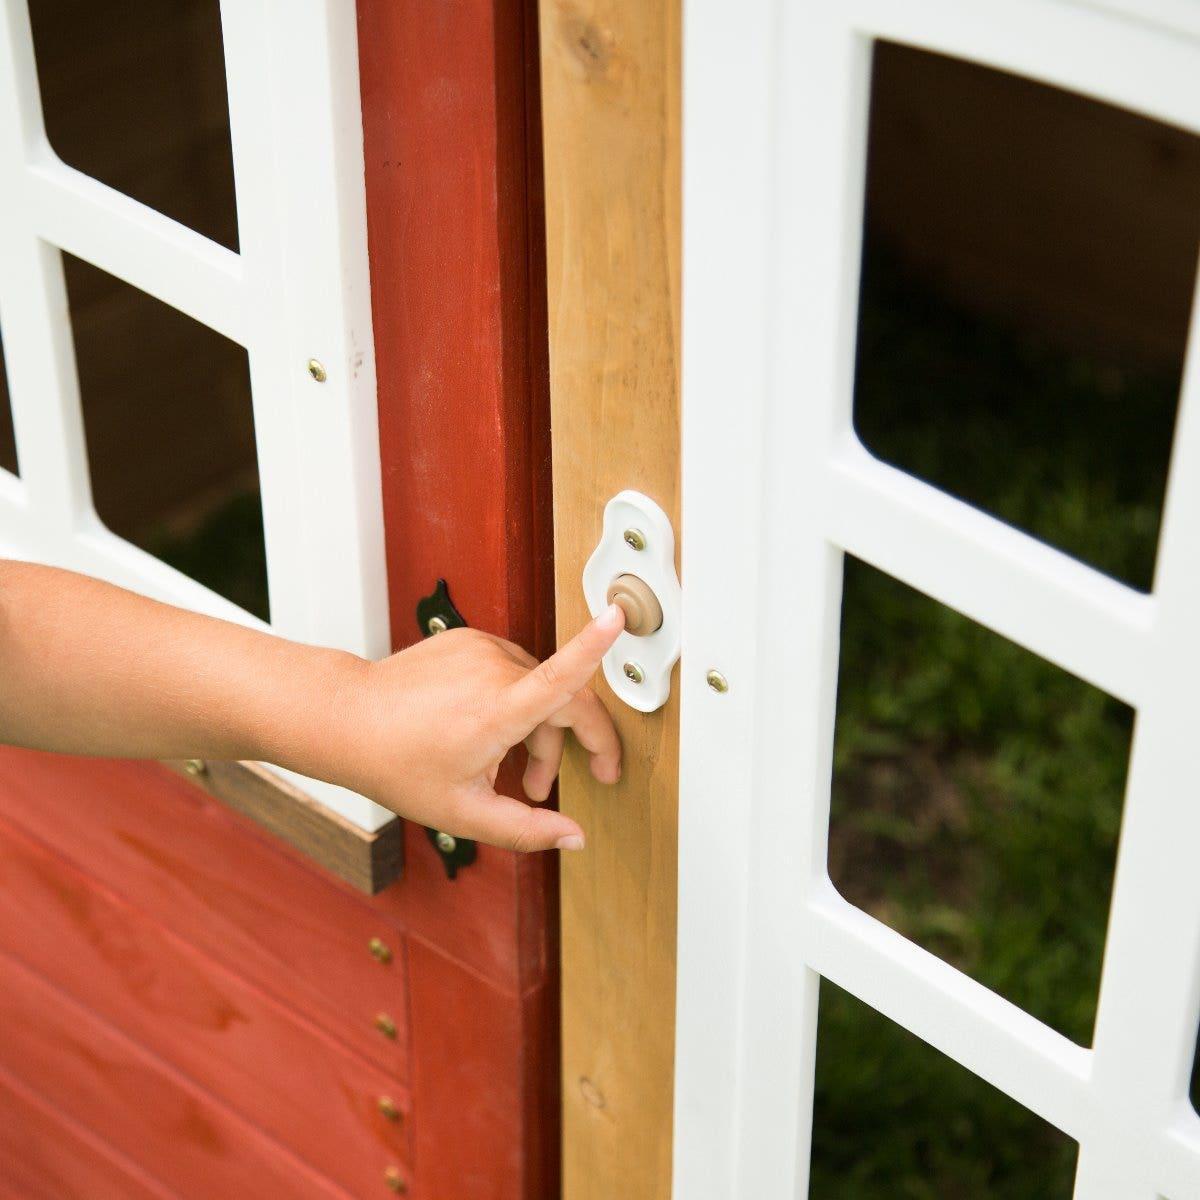 Doorbell that rings